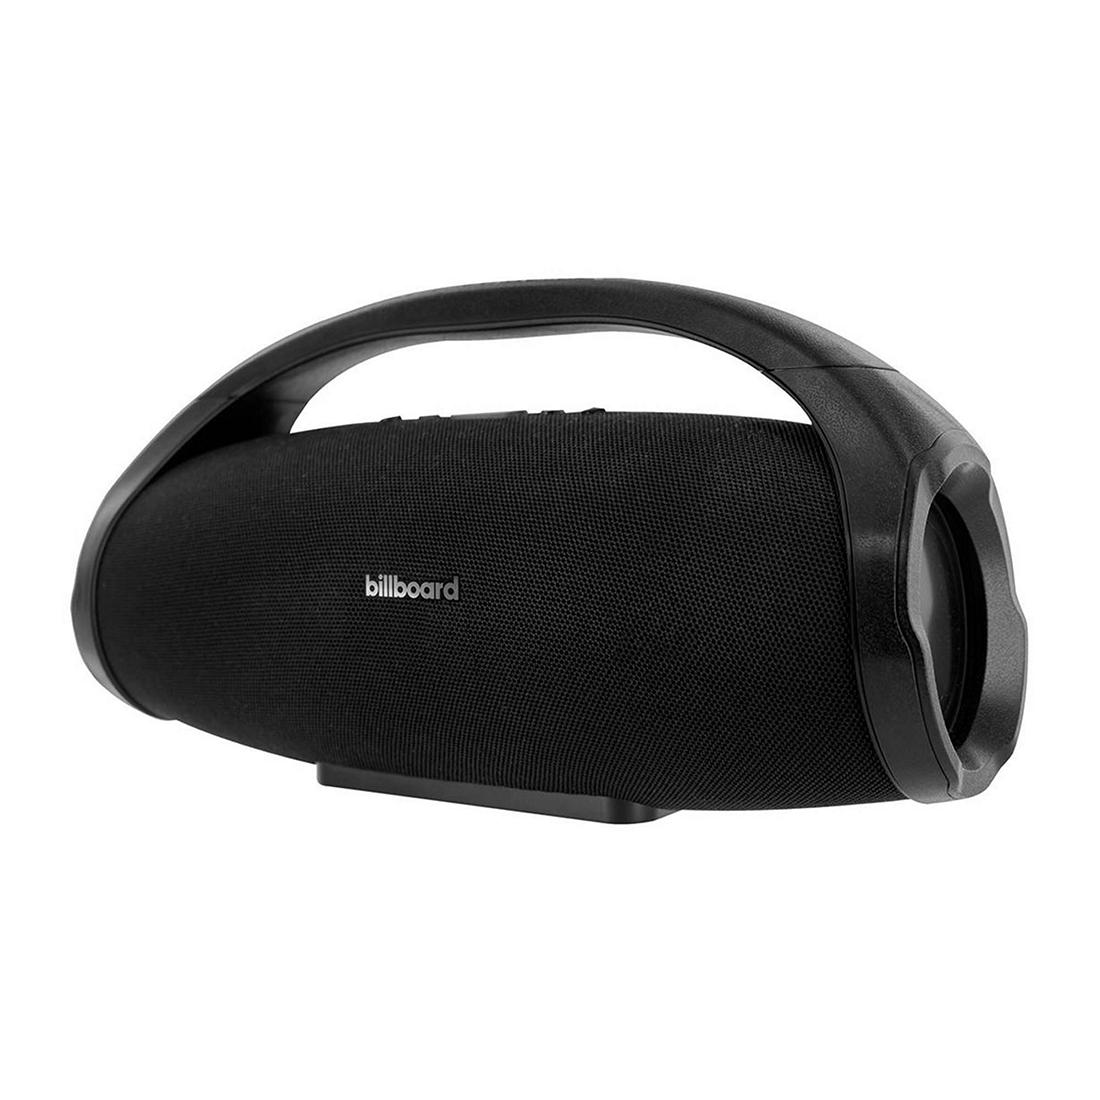 Billboard BB1000 Boombox Speaker with Bluetooth